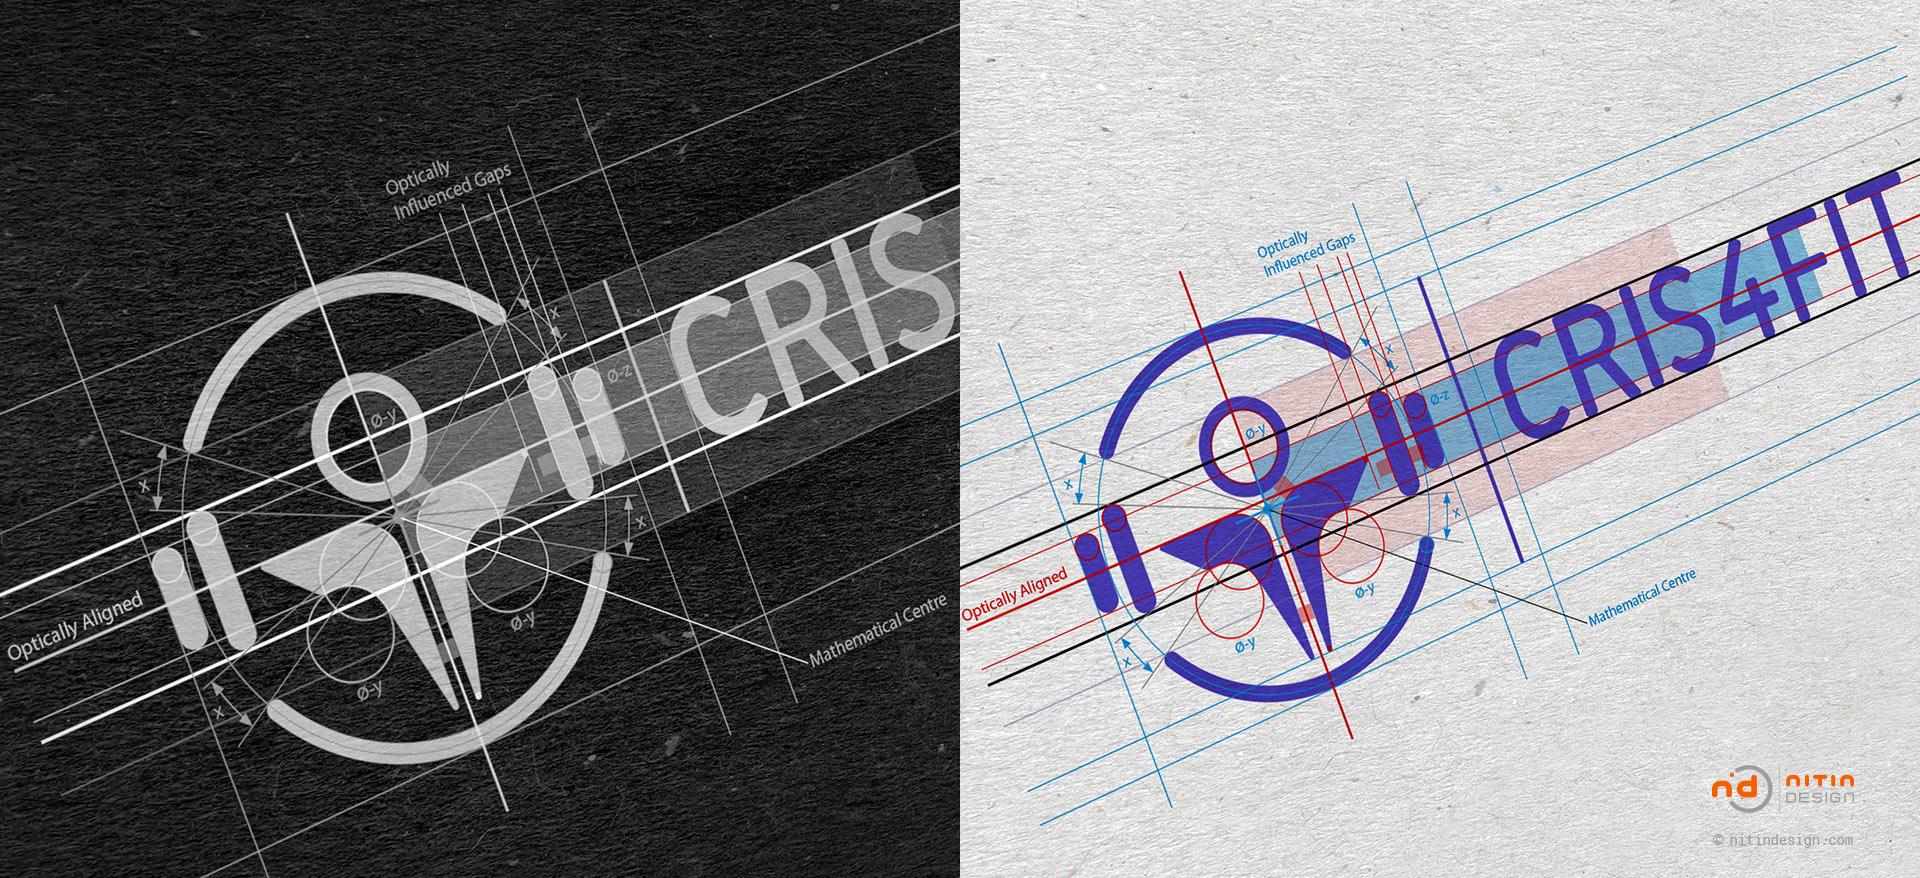 Cristin-fitness-Cris4Fit-Nitin-Design